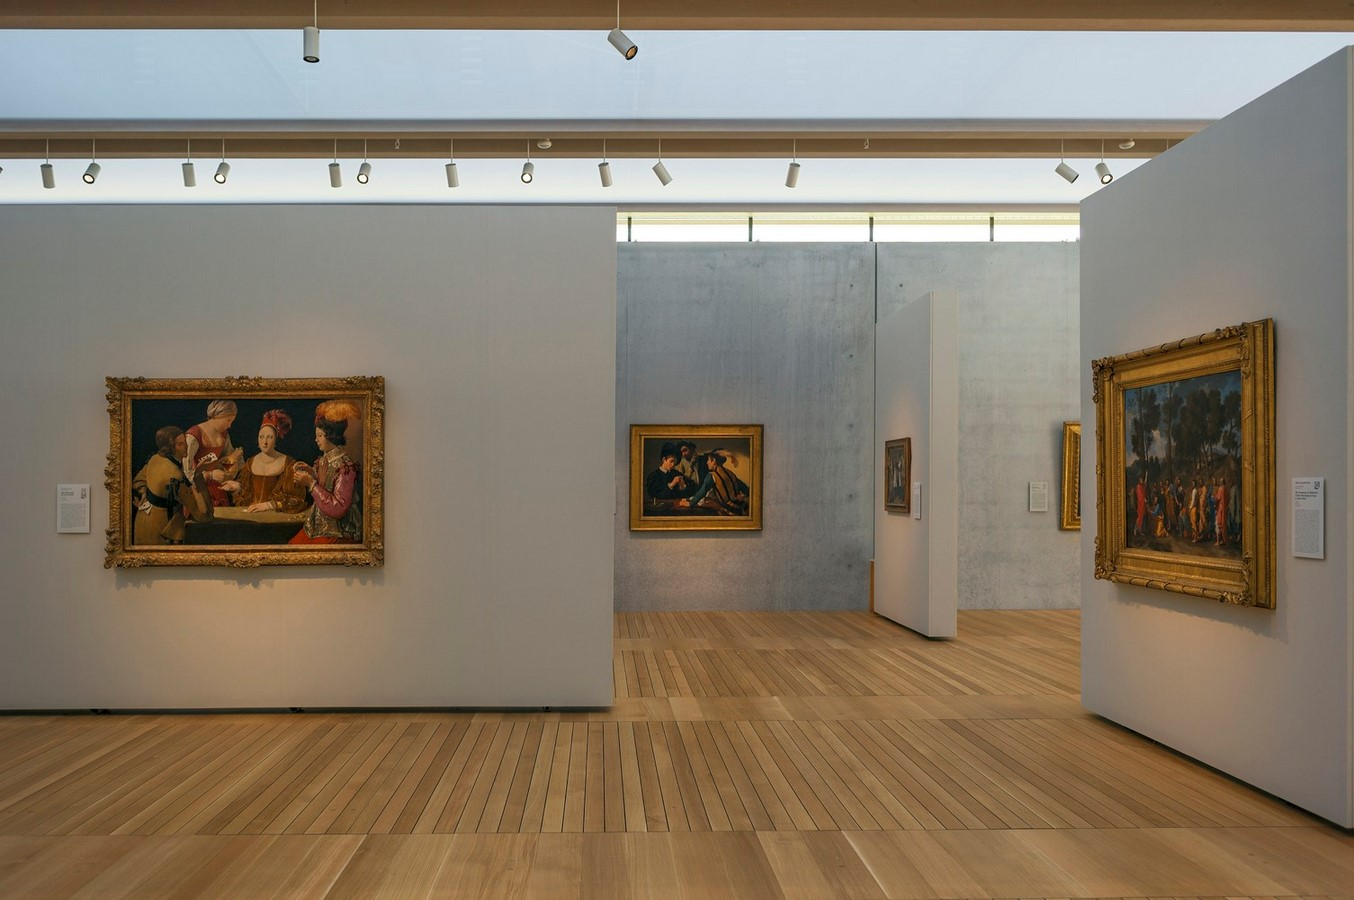 Kimbell Art Museum by Renzo Piano: Mecca of modern architecture - Sheet7